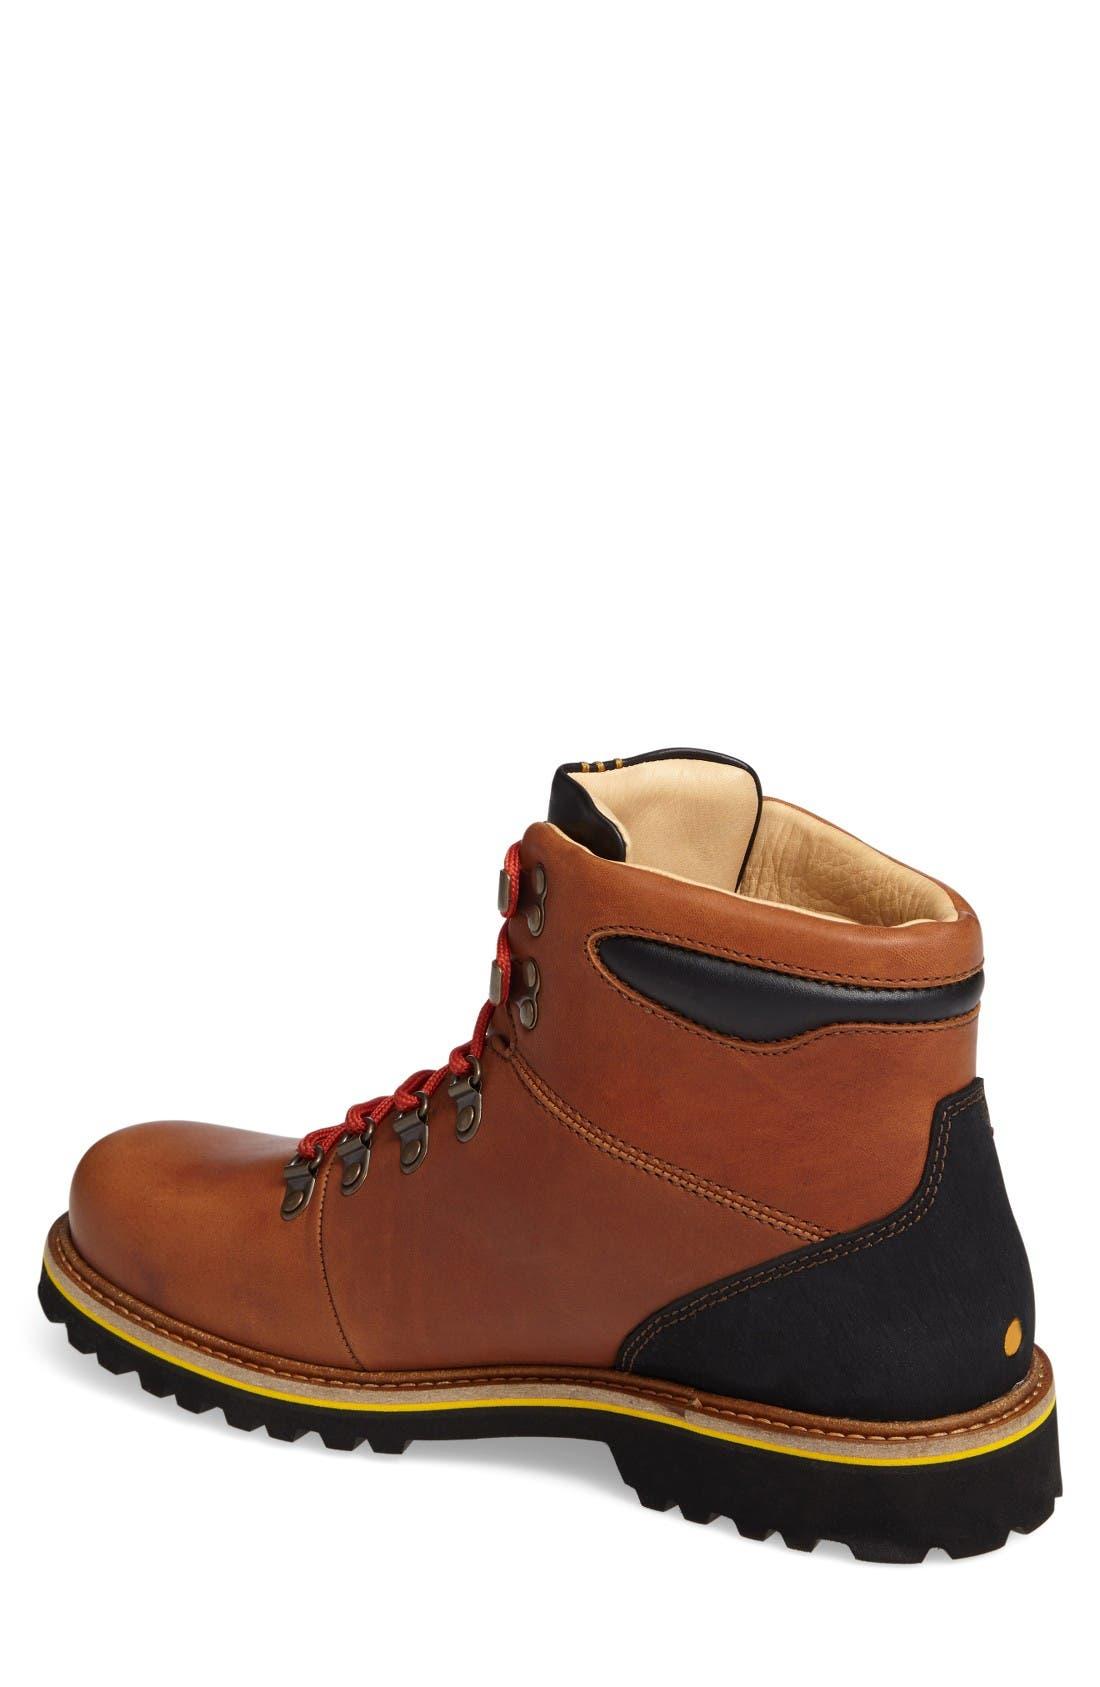 Mt. Tam Hiking Boot,                             Alternate thumbnail 2, color,                             Saddlebag Tan Leather